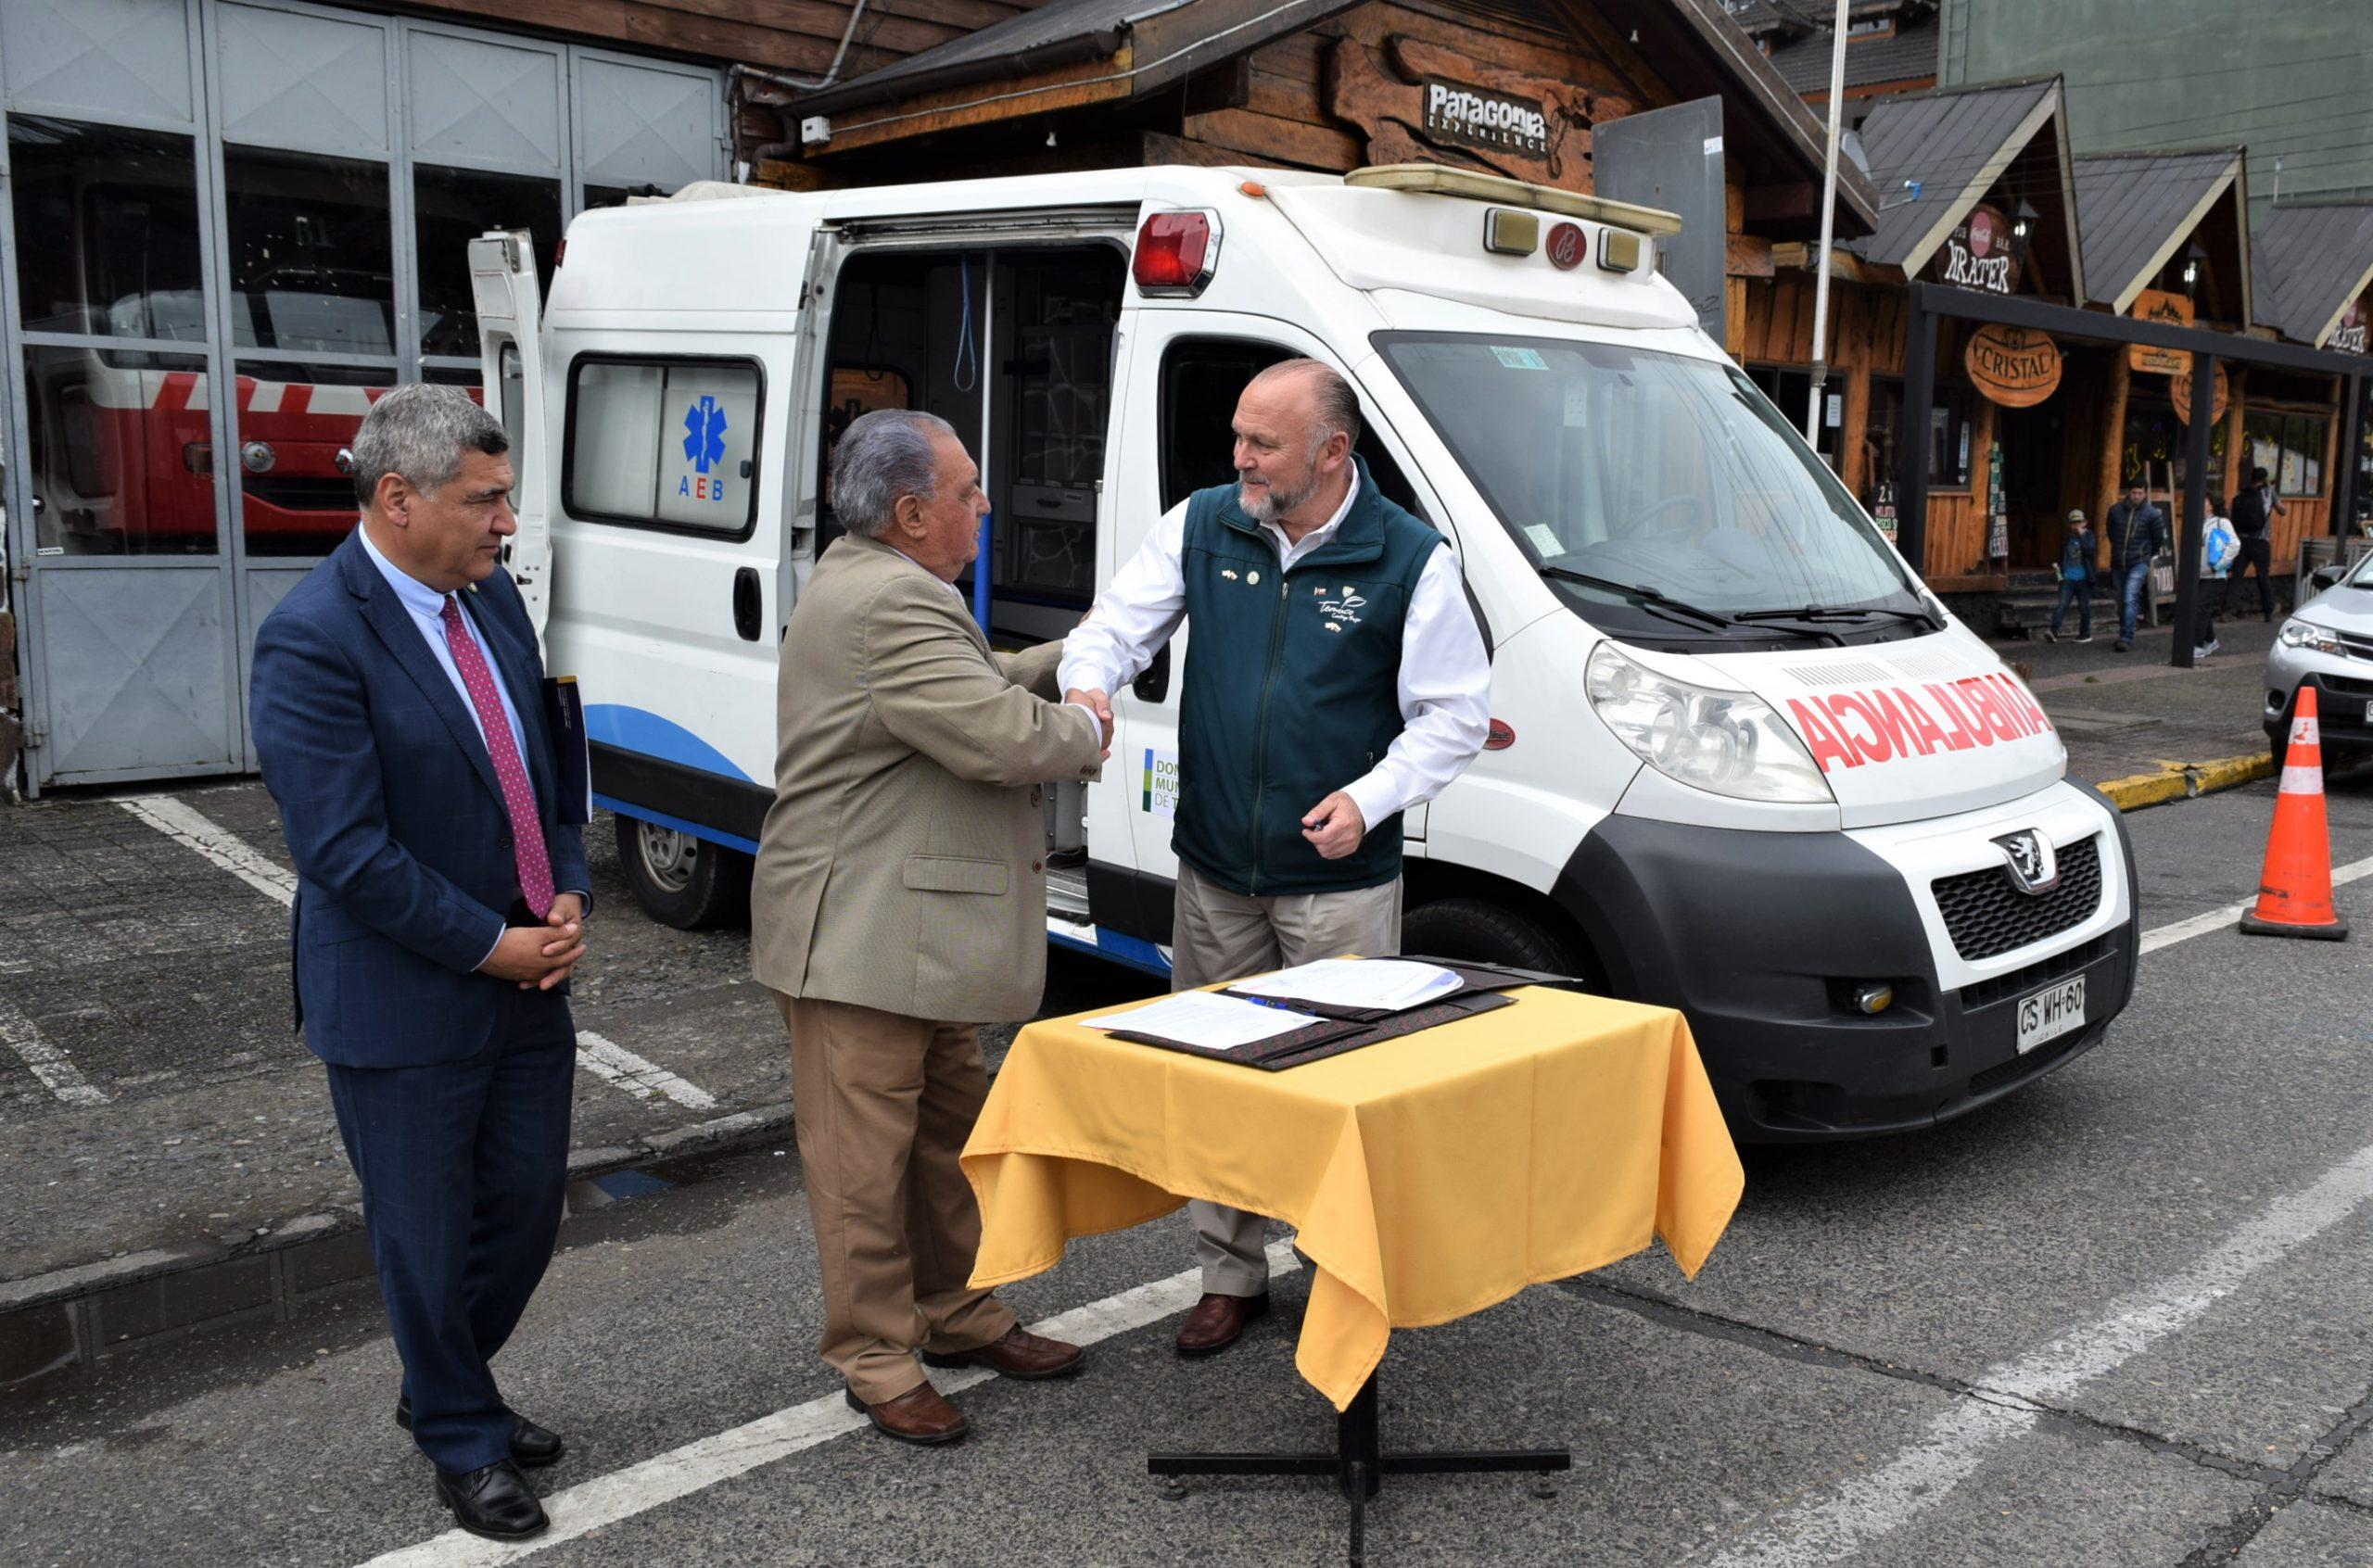 Municipio de Temuco Dona Ambulancia a Pucón y Camioneta Con Chipeadora a Loncoche